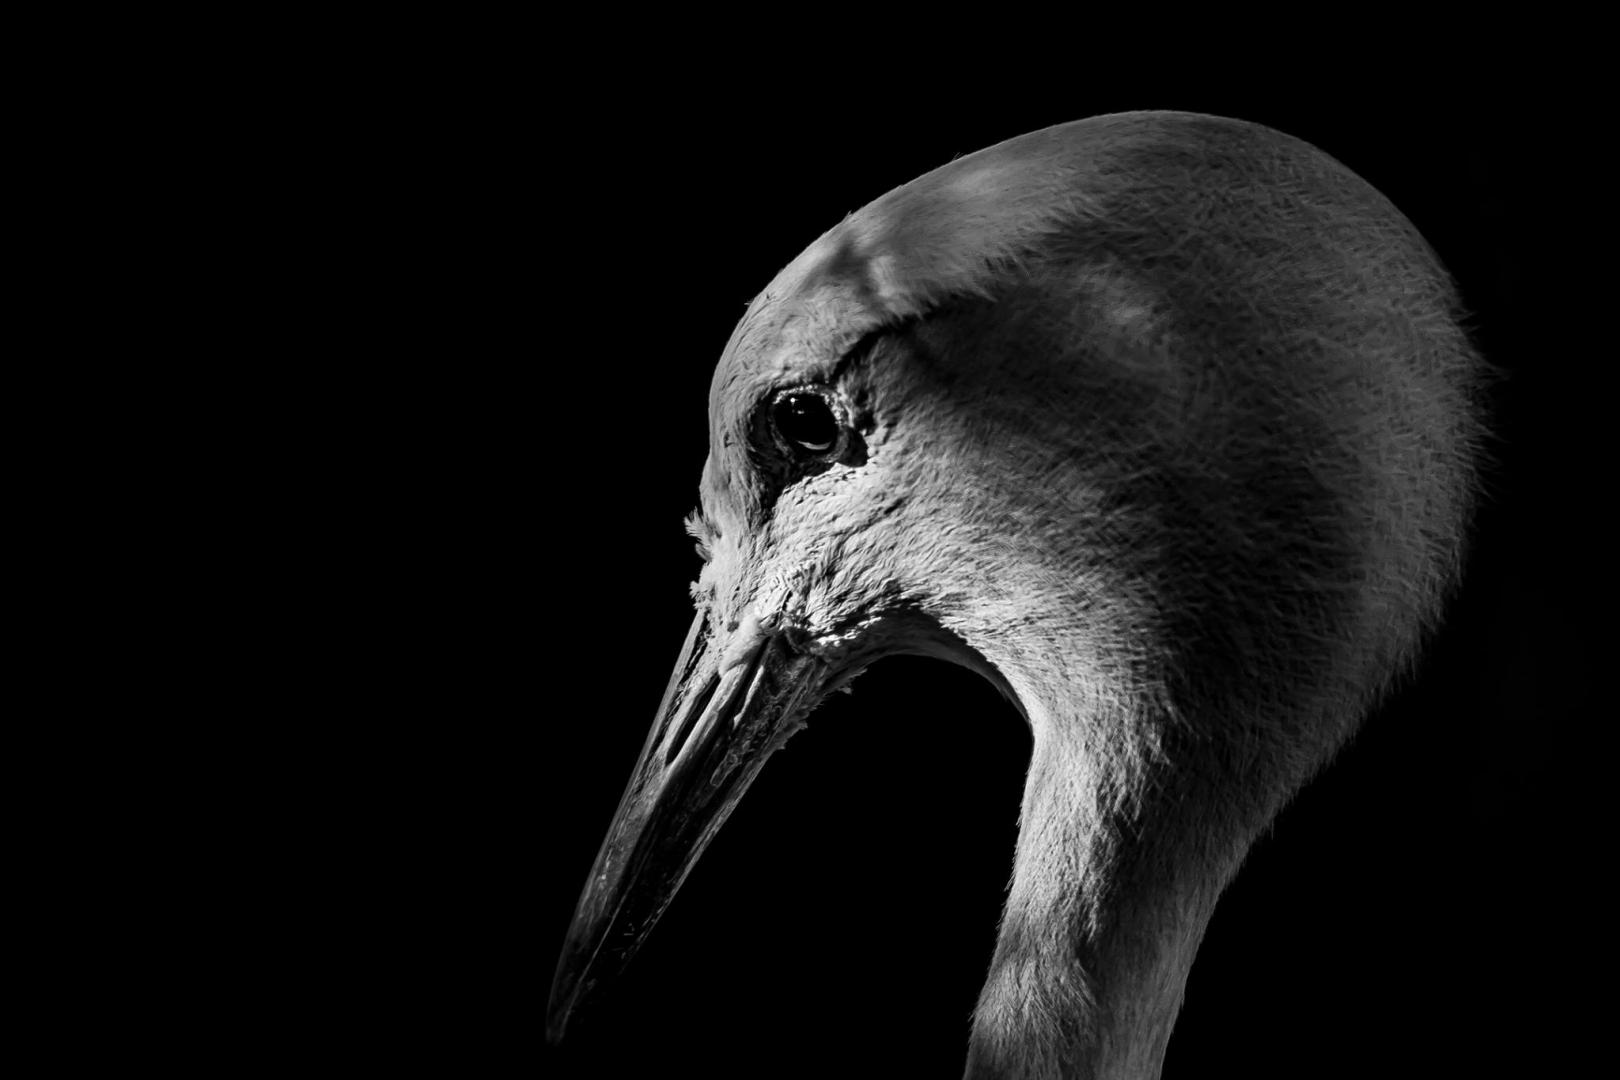 bird black and white beak lighting portrait profile